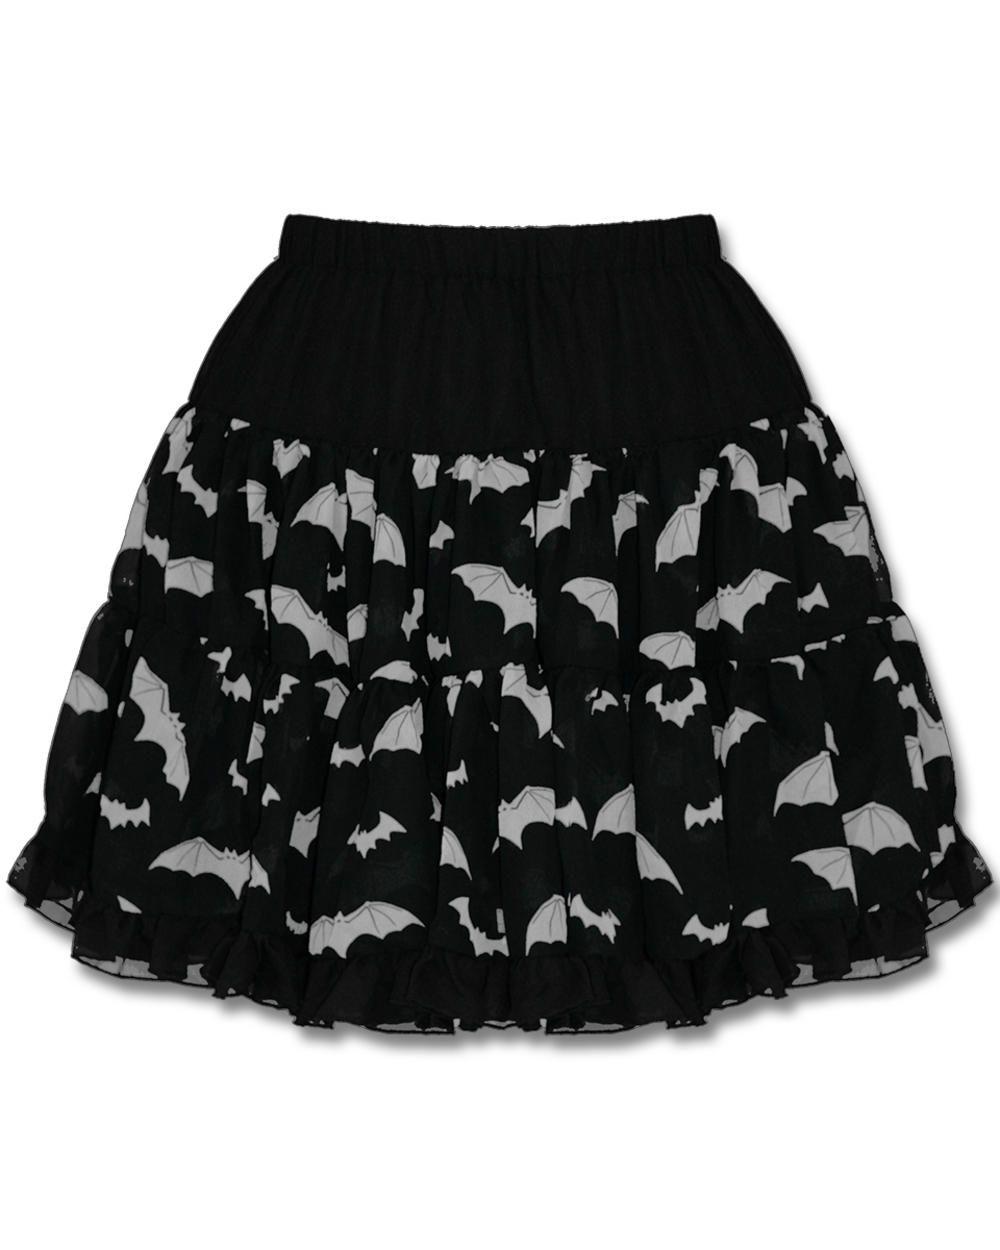 HELL BUNNY BAT SKIRT - BLACK & WHITE | Clothes: Dresses/Skirts ...